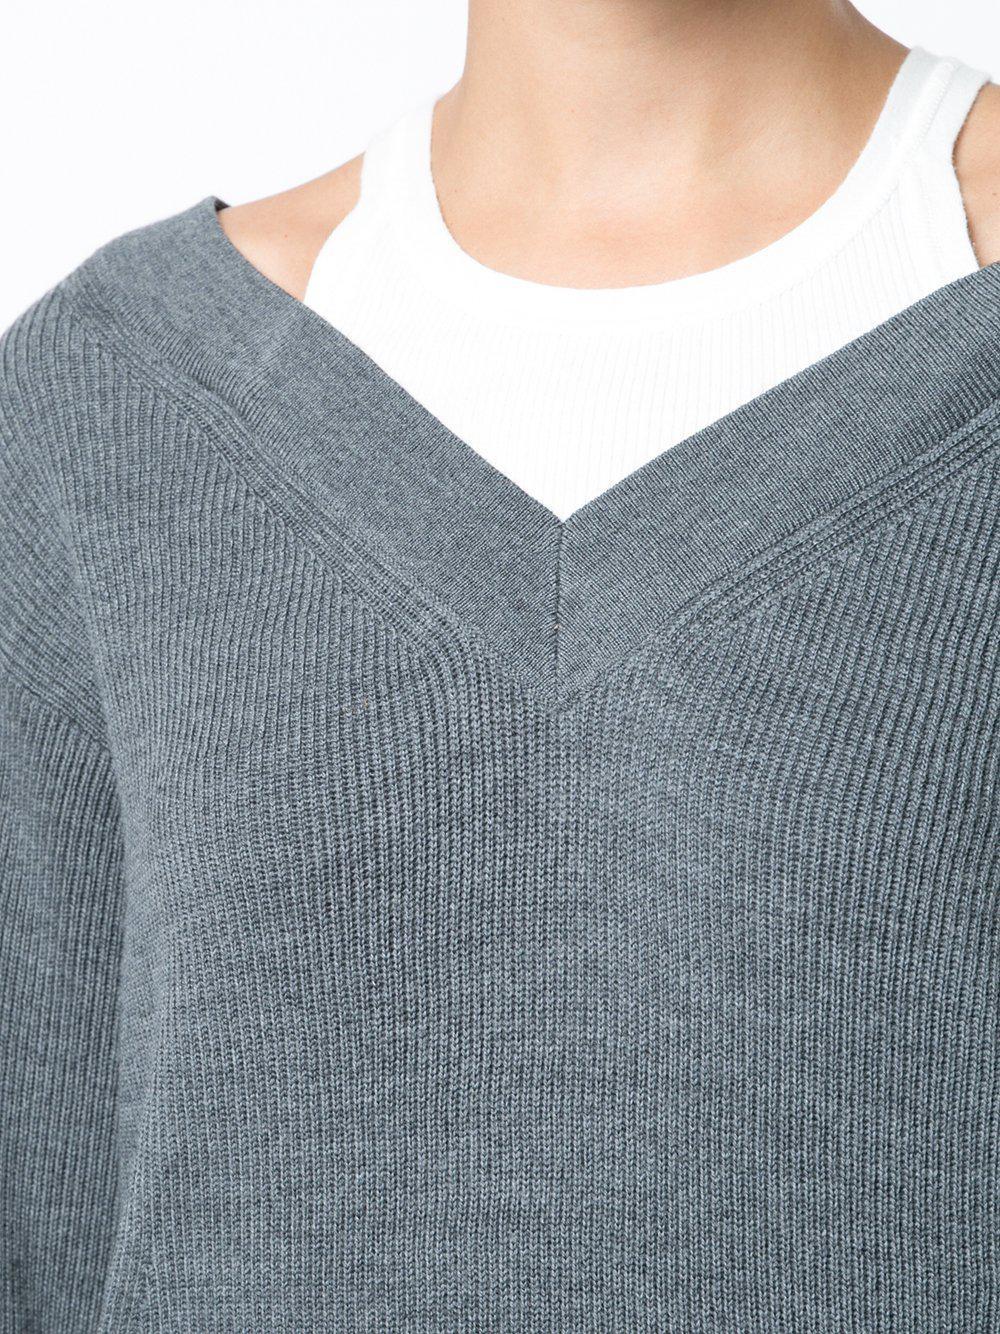 d4bf6d8ee003 Lyst - T By Alexander Wang Bi-layer Off Shoulder W inner Tank Sweater